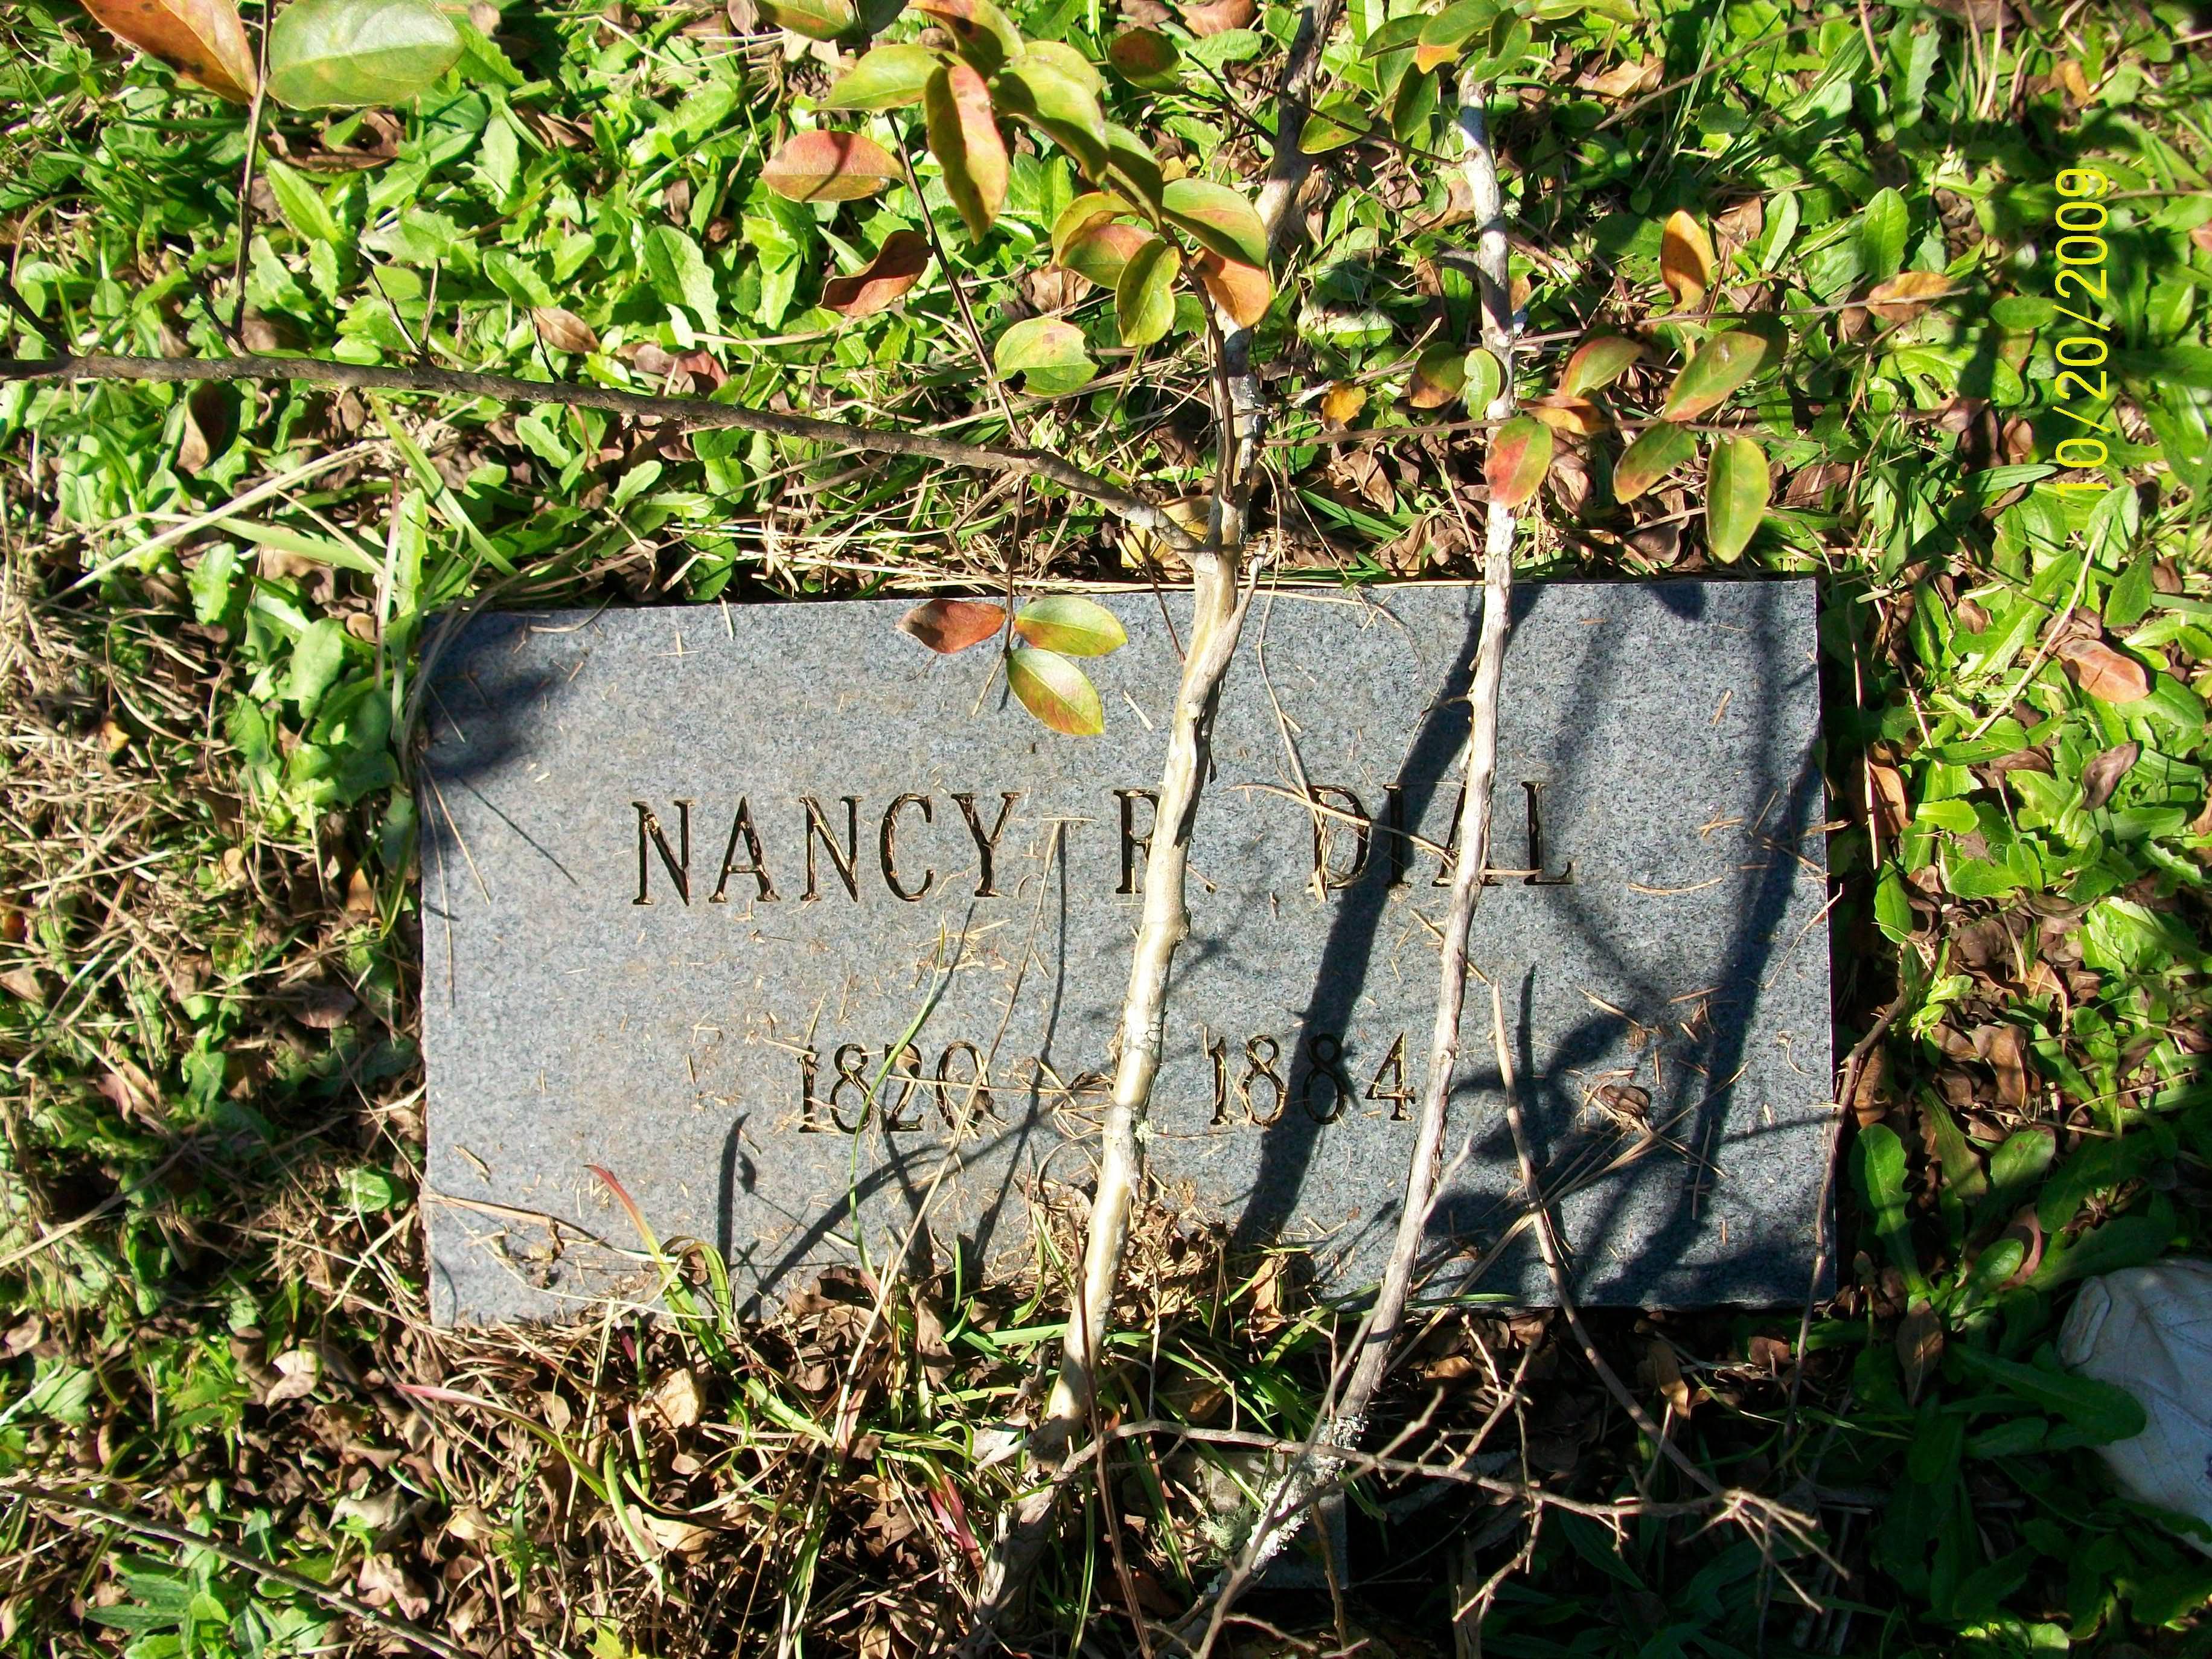 Nancy Dial